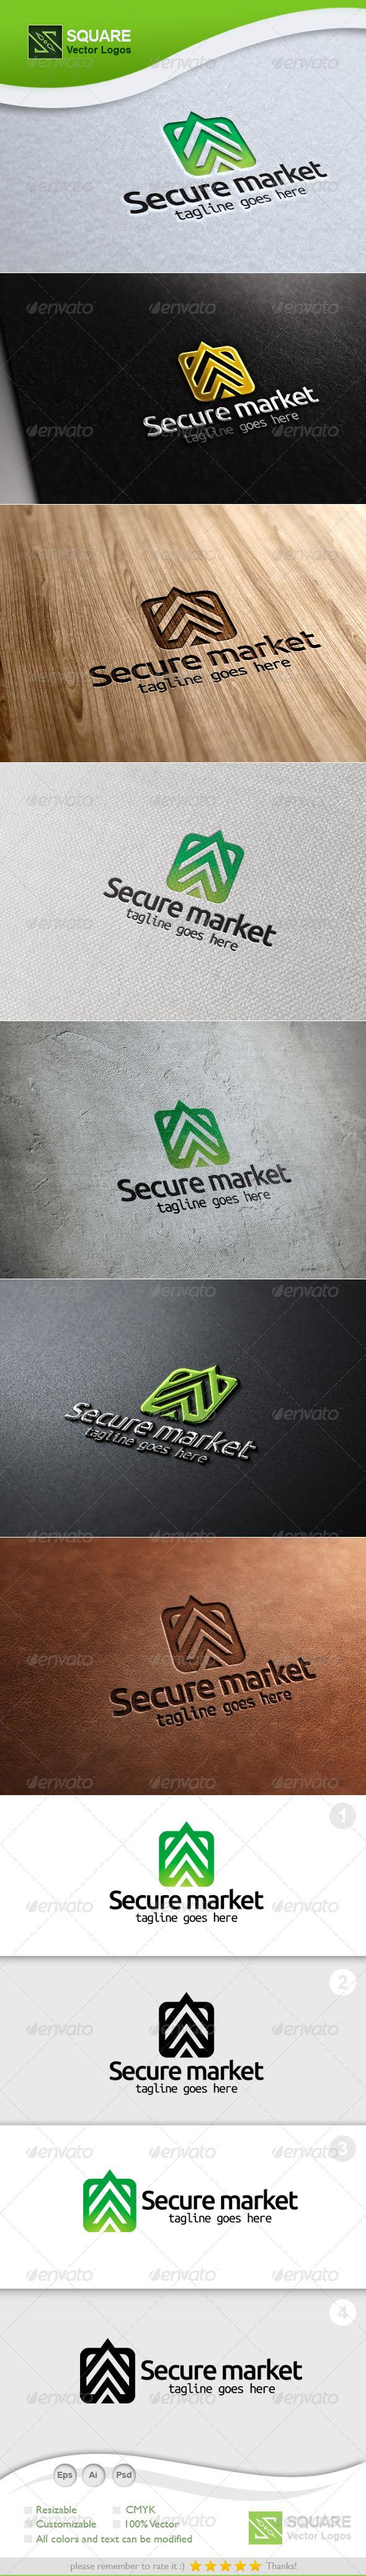 Secure, Market Vector Logo Template - Symbols Logo Templates